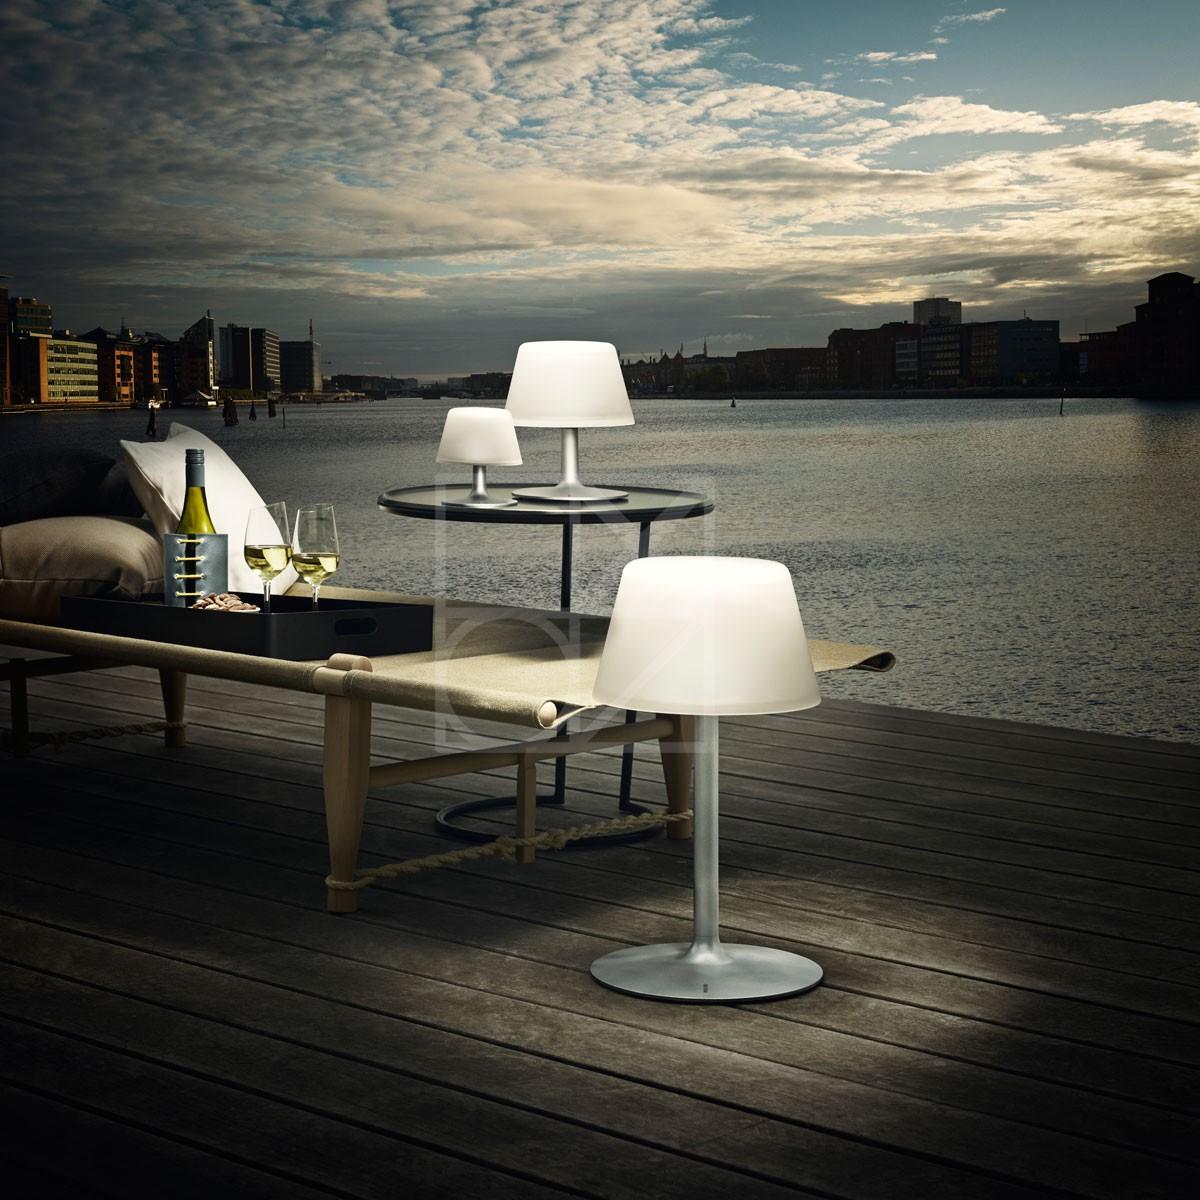 Lampe solaire Chez Aldi Unique Image Lampe solaire Pour Balcon Fashion Designs